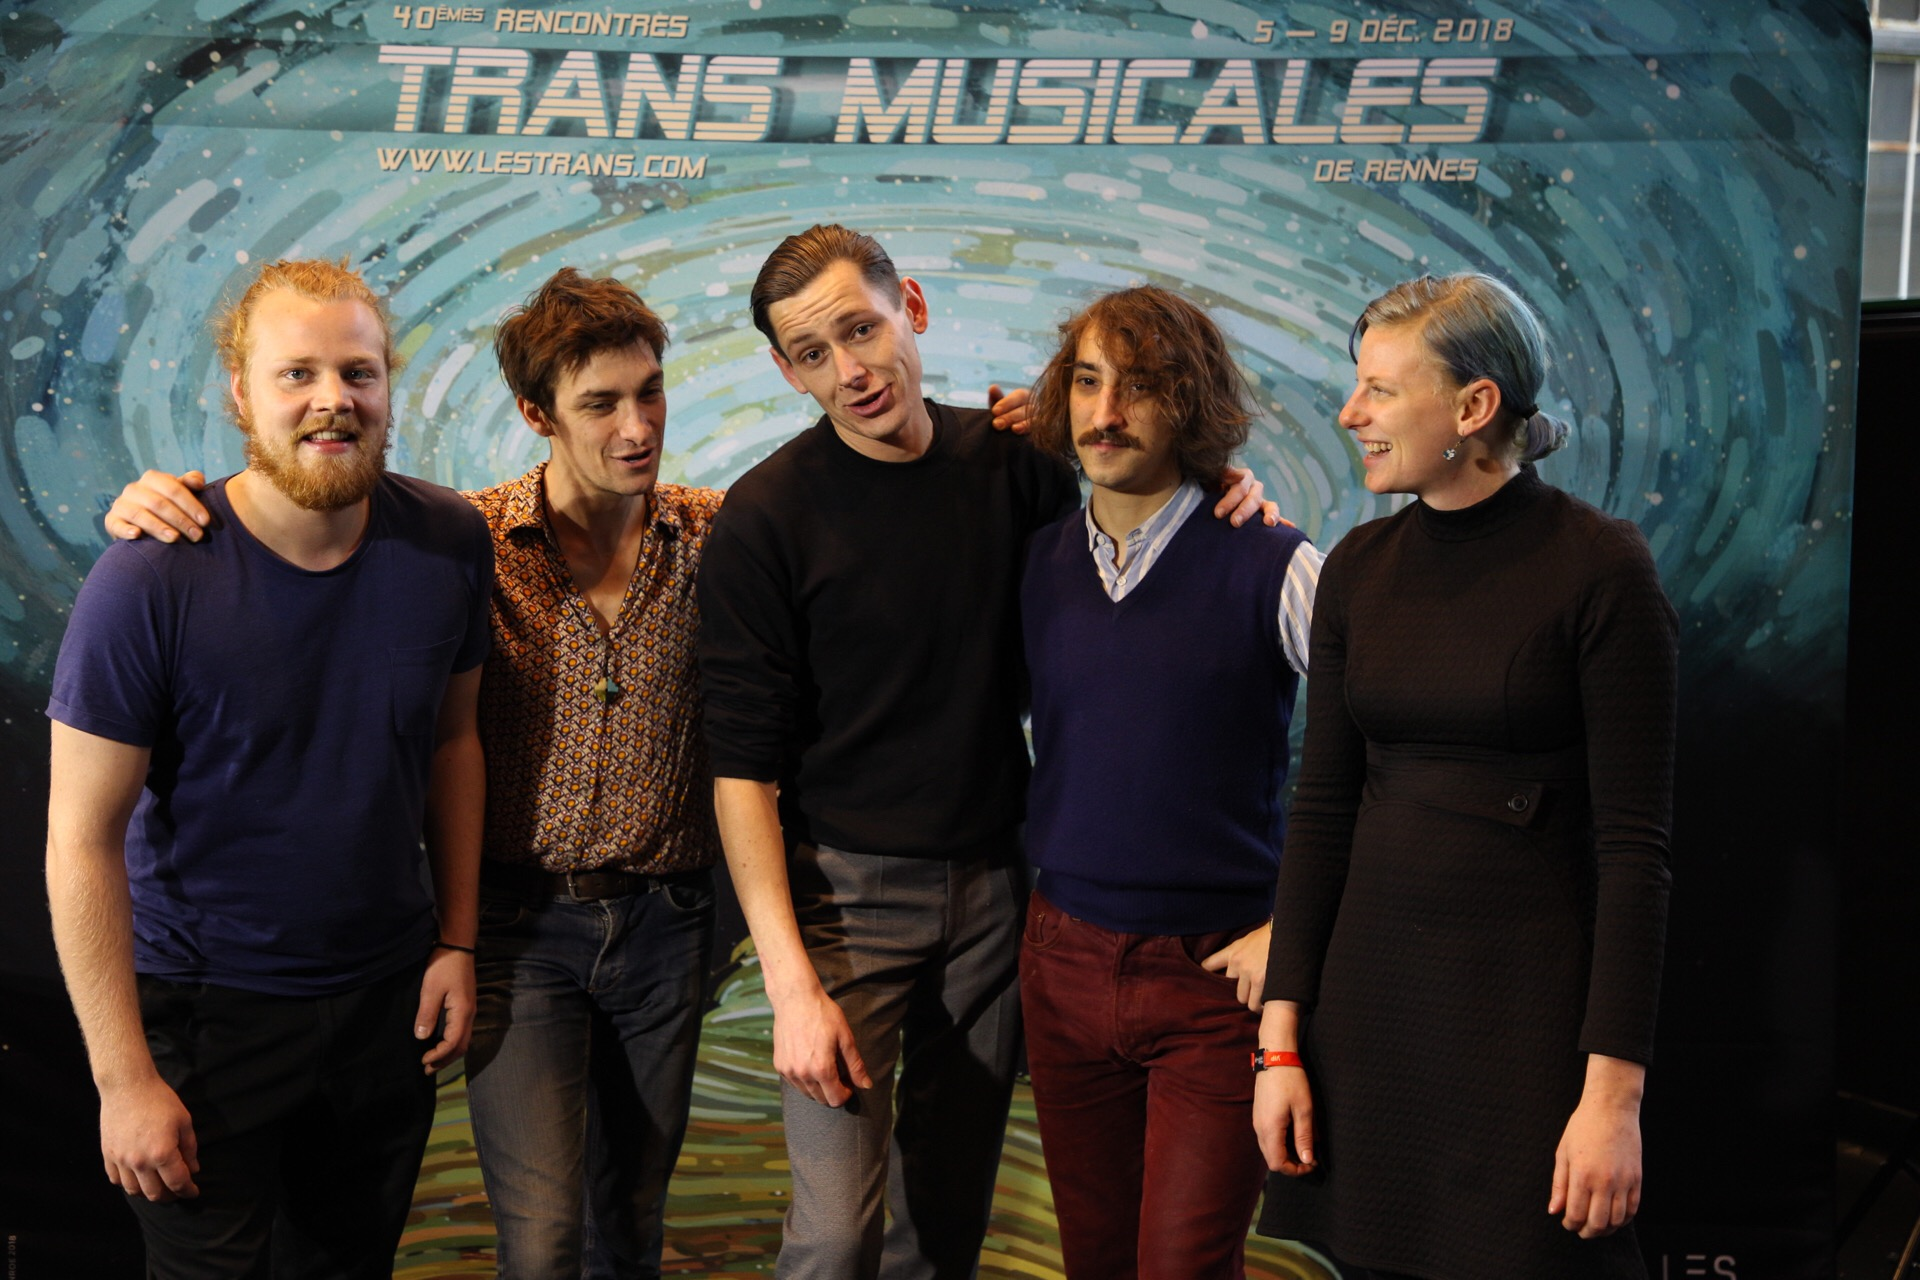 rencontre trans montreal